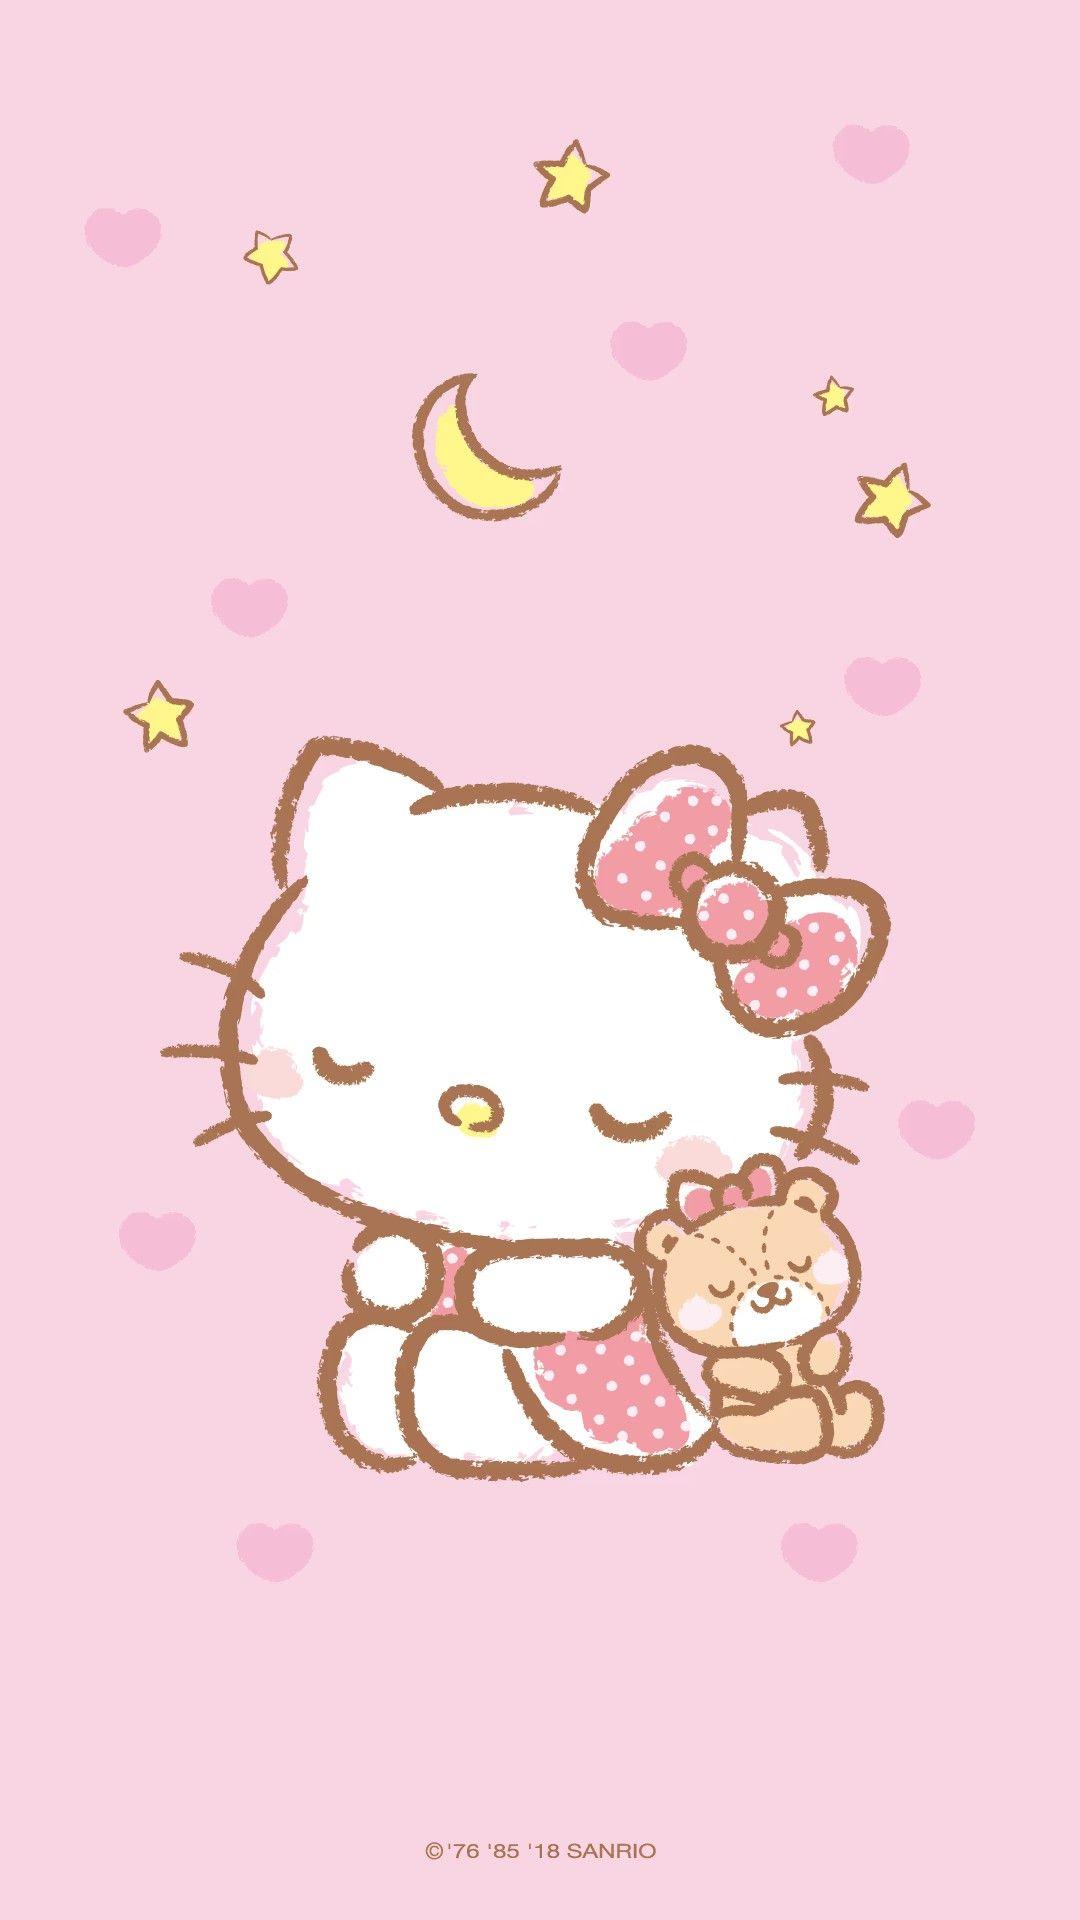 Hello Kitty Aesthetic Background : hello, kitty, aesthetic, background, Hello, Kitty, Drawing,, Iphone, Wallpaper,, Backgrounds